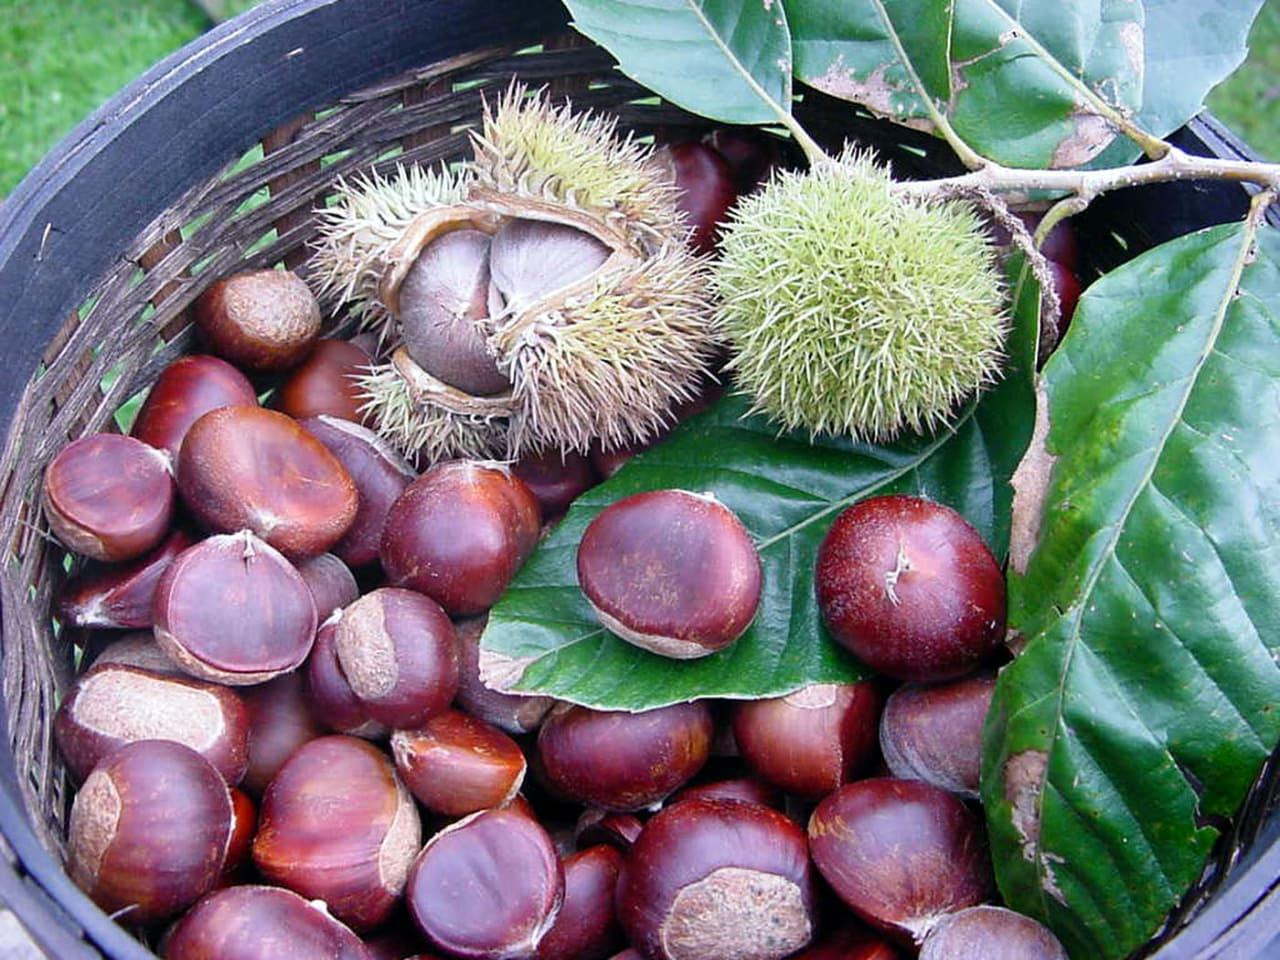 elos village, chestnut festival elos chania crete, activities chania, events chania crete